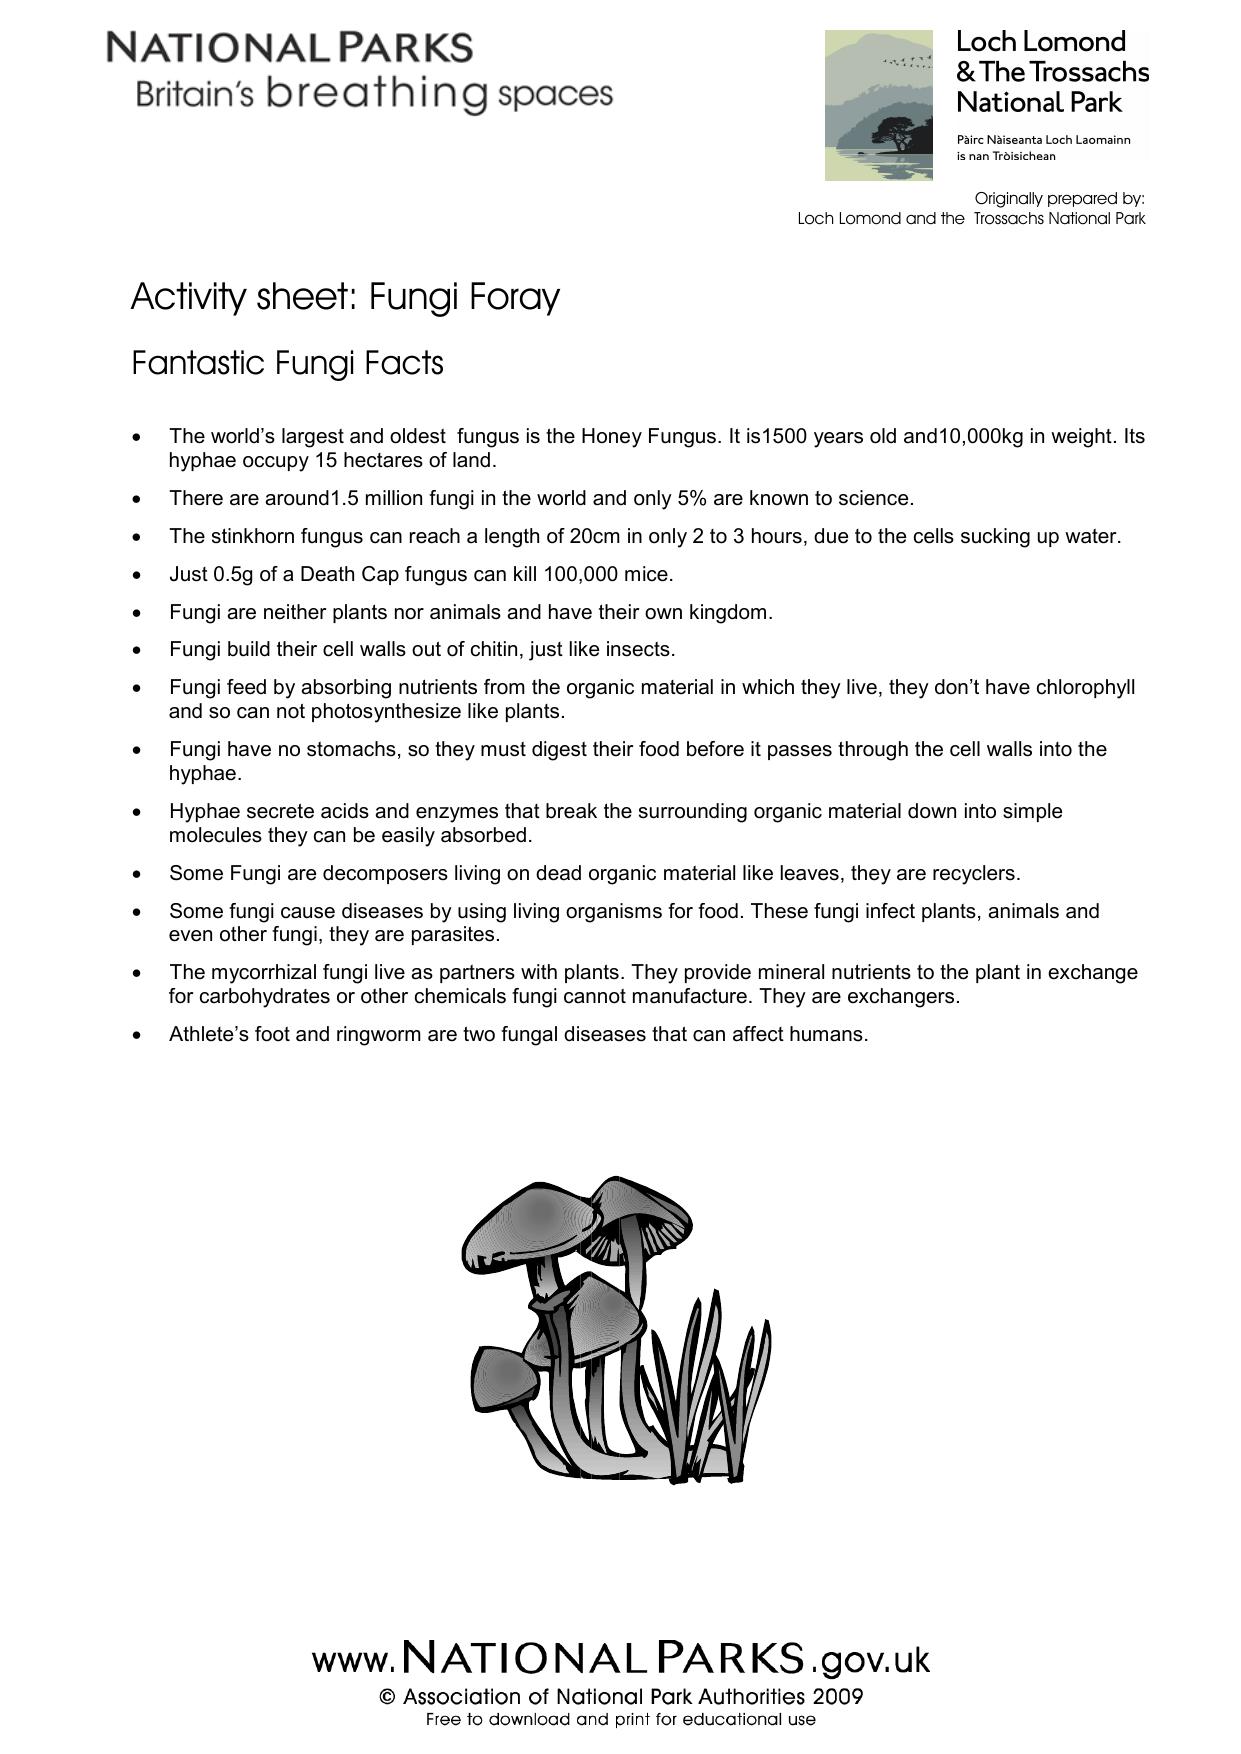 Activity worksheet Fungi foray